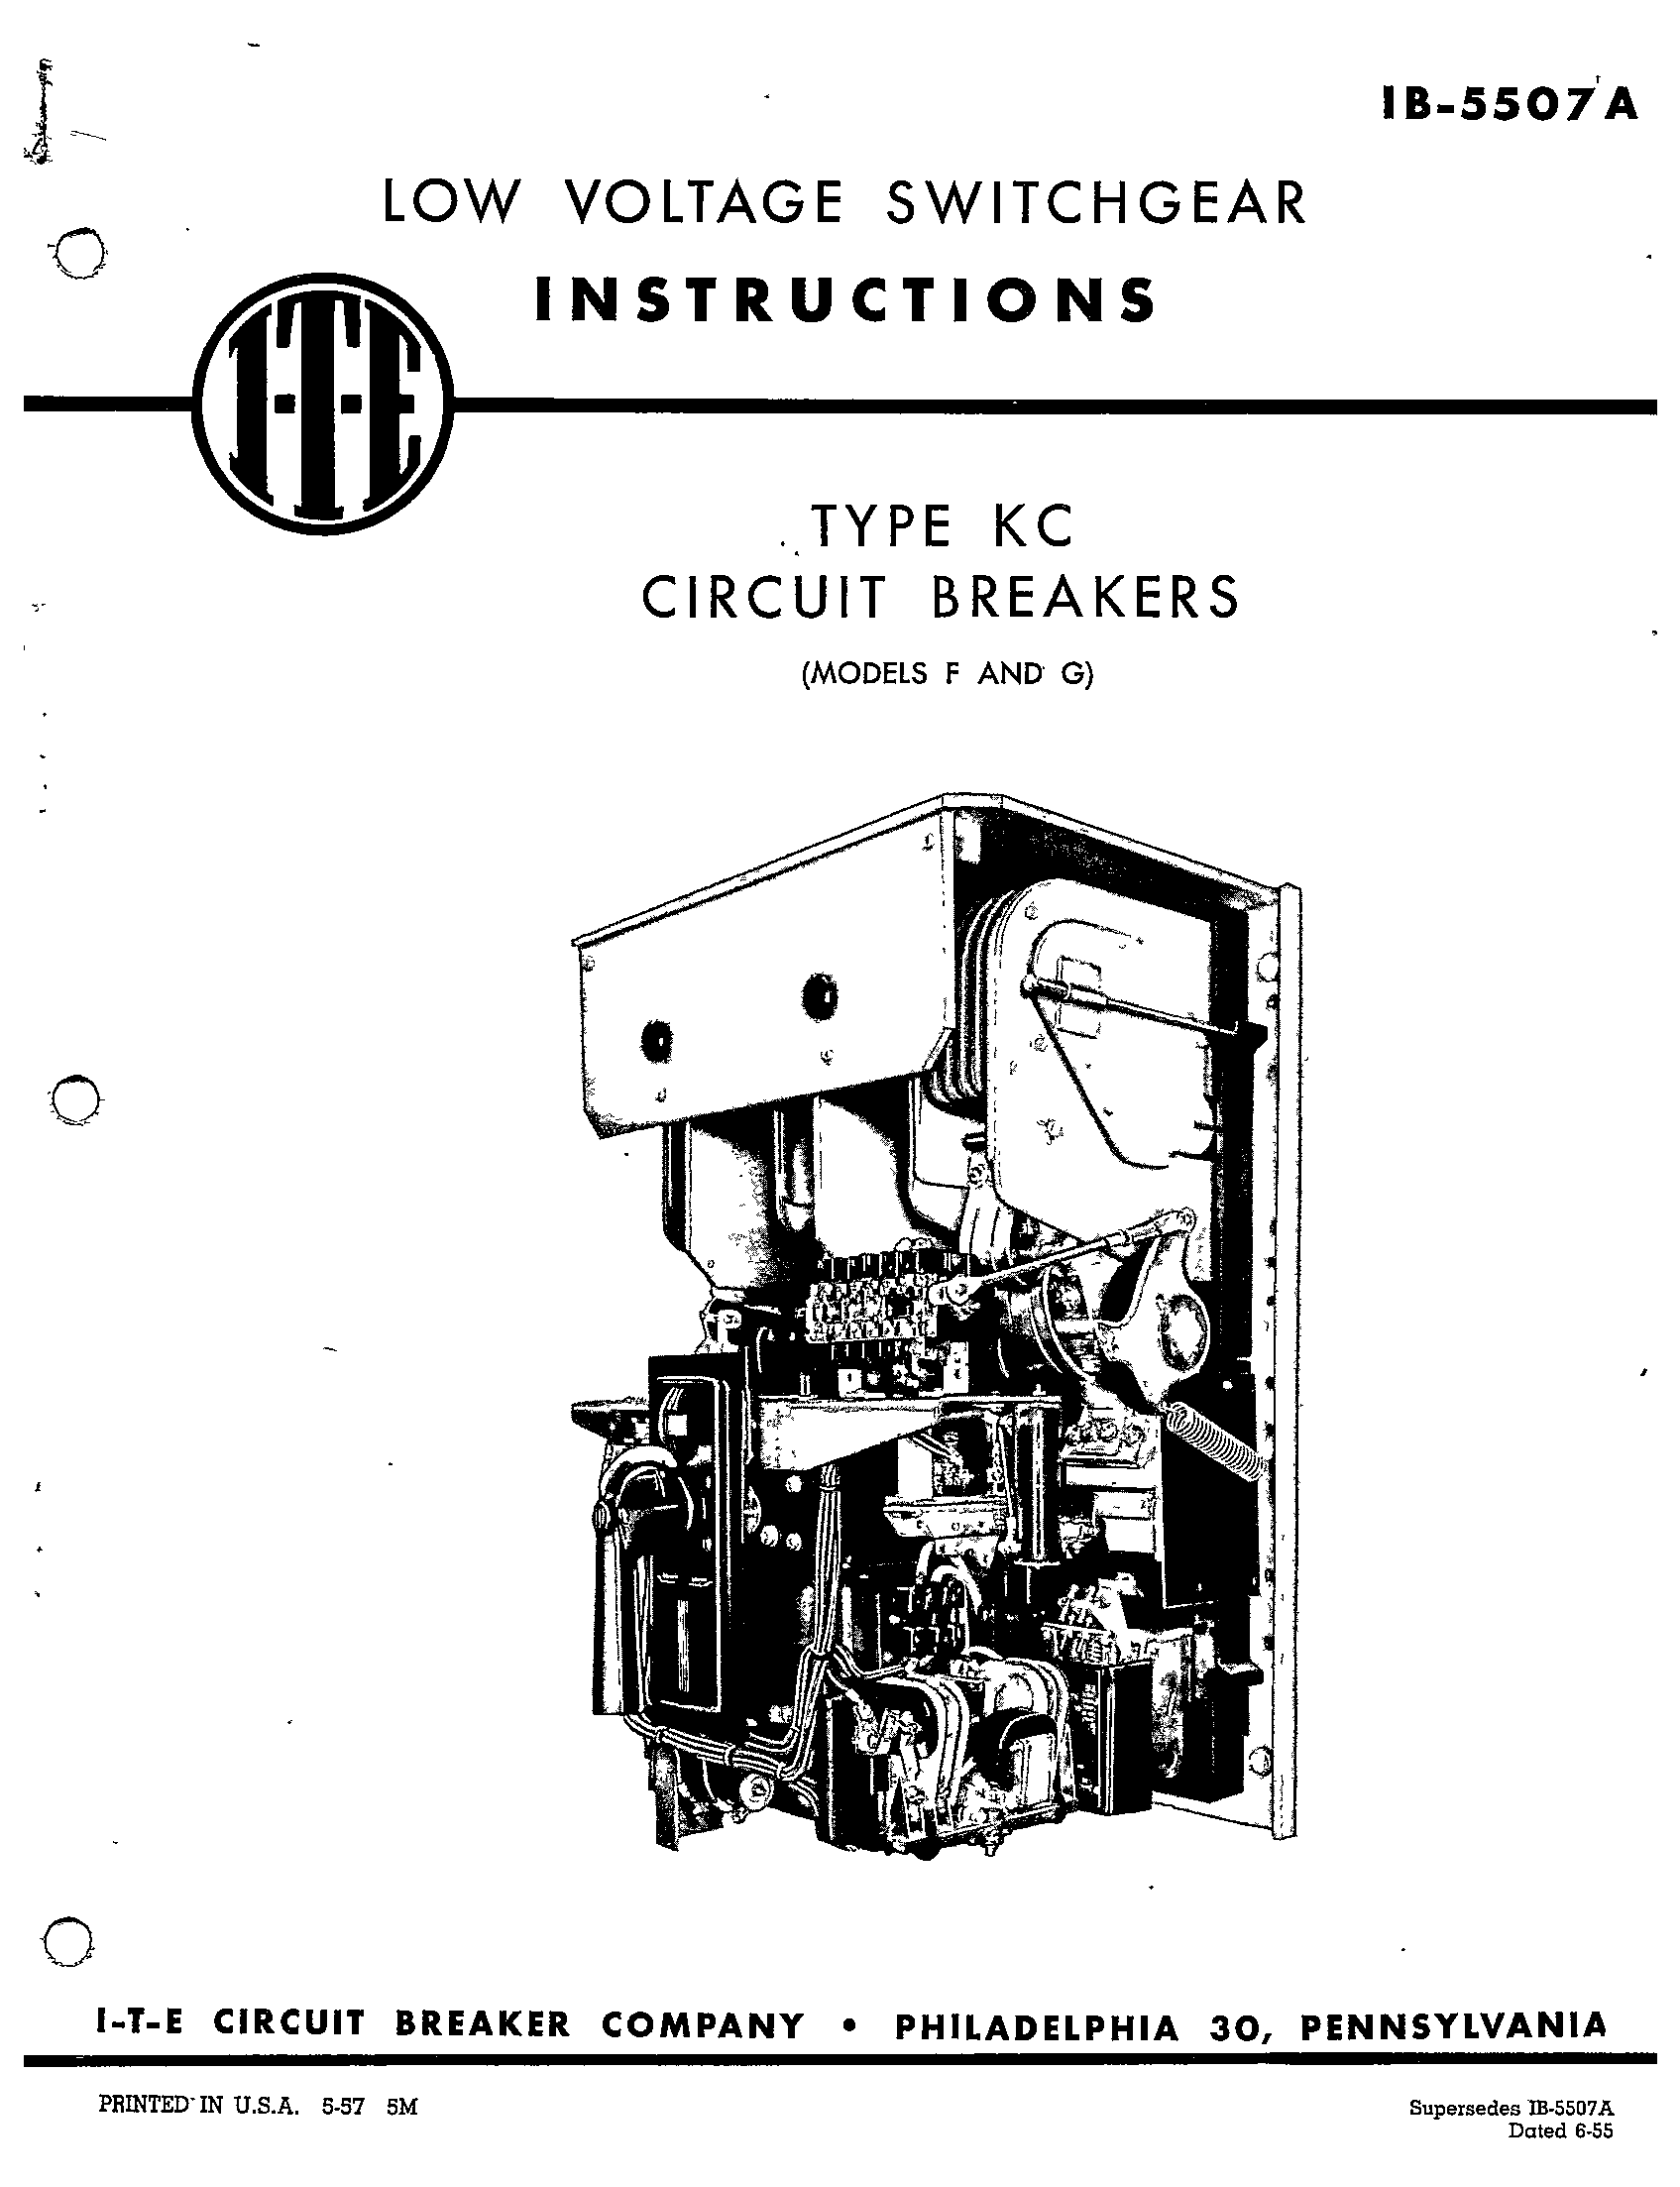 IB-5507A TYPE KC CIRCUIT BREAKERS (MODELS F AND G) Manual